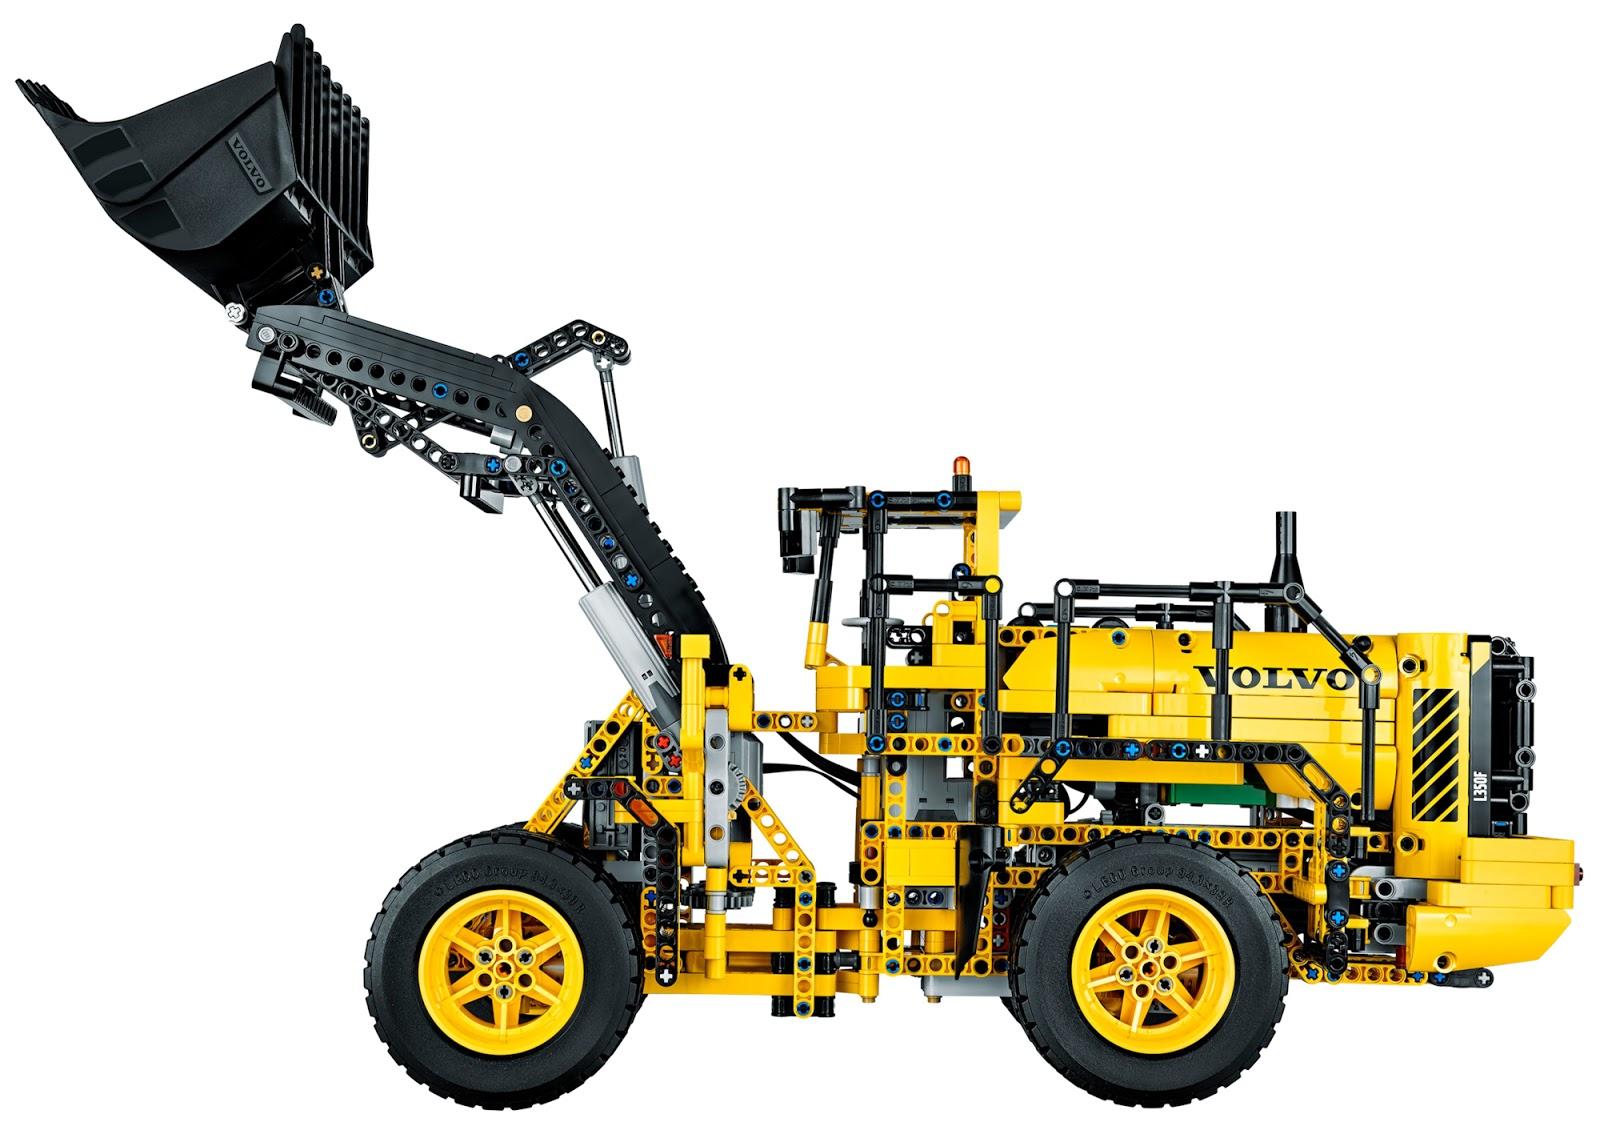 the brickverse designing the lego technic volvo l350f. Black Bedroom Furniture Sets. Home Design Ideas